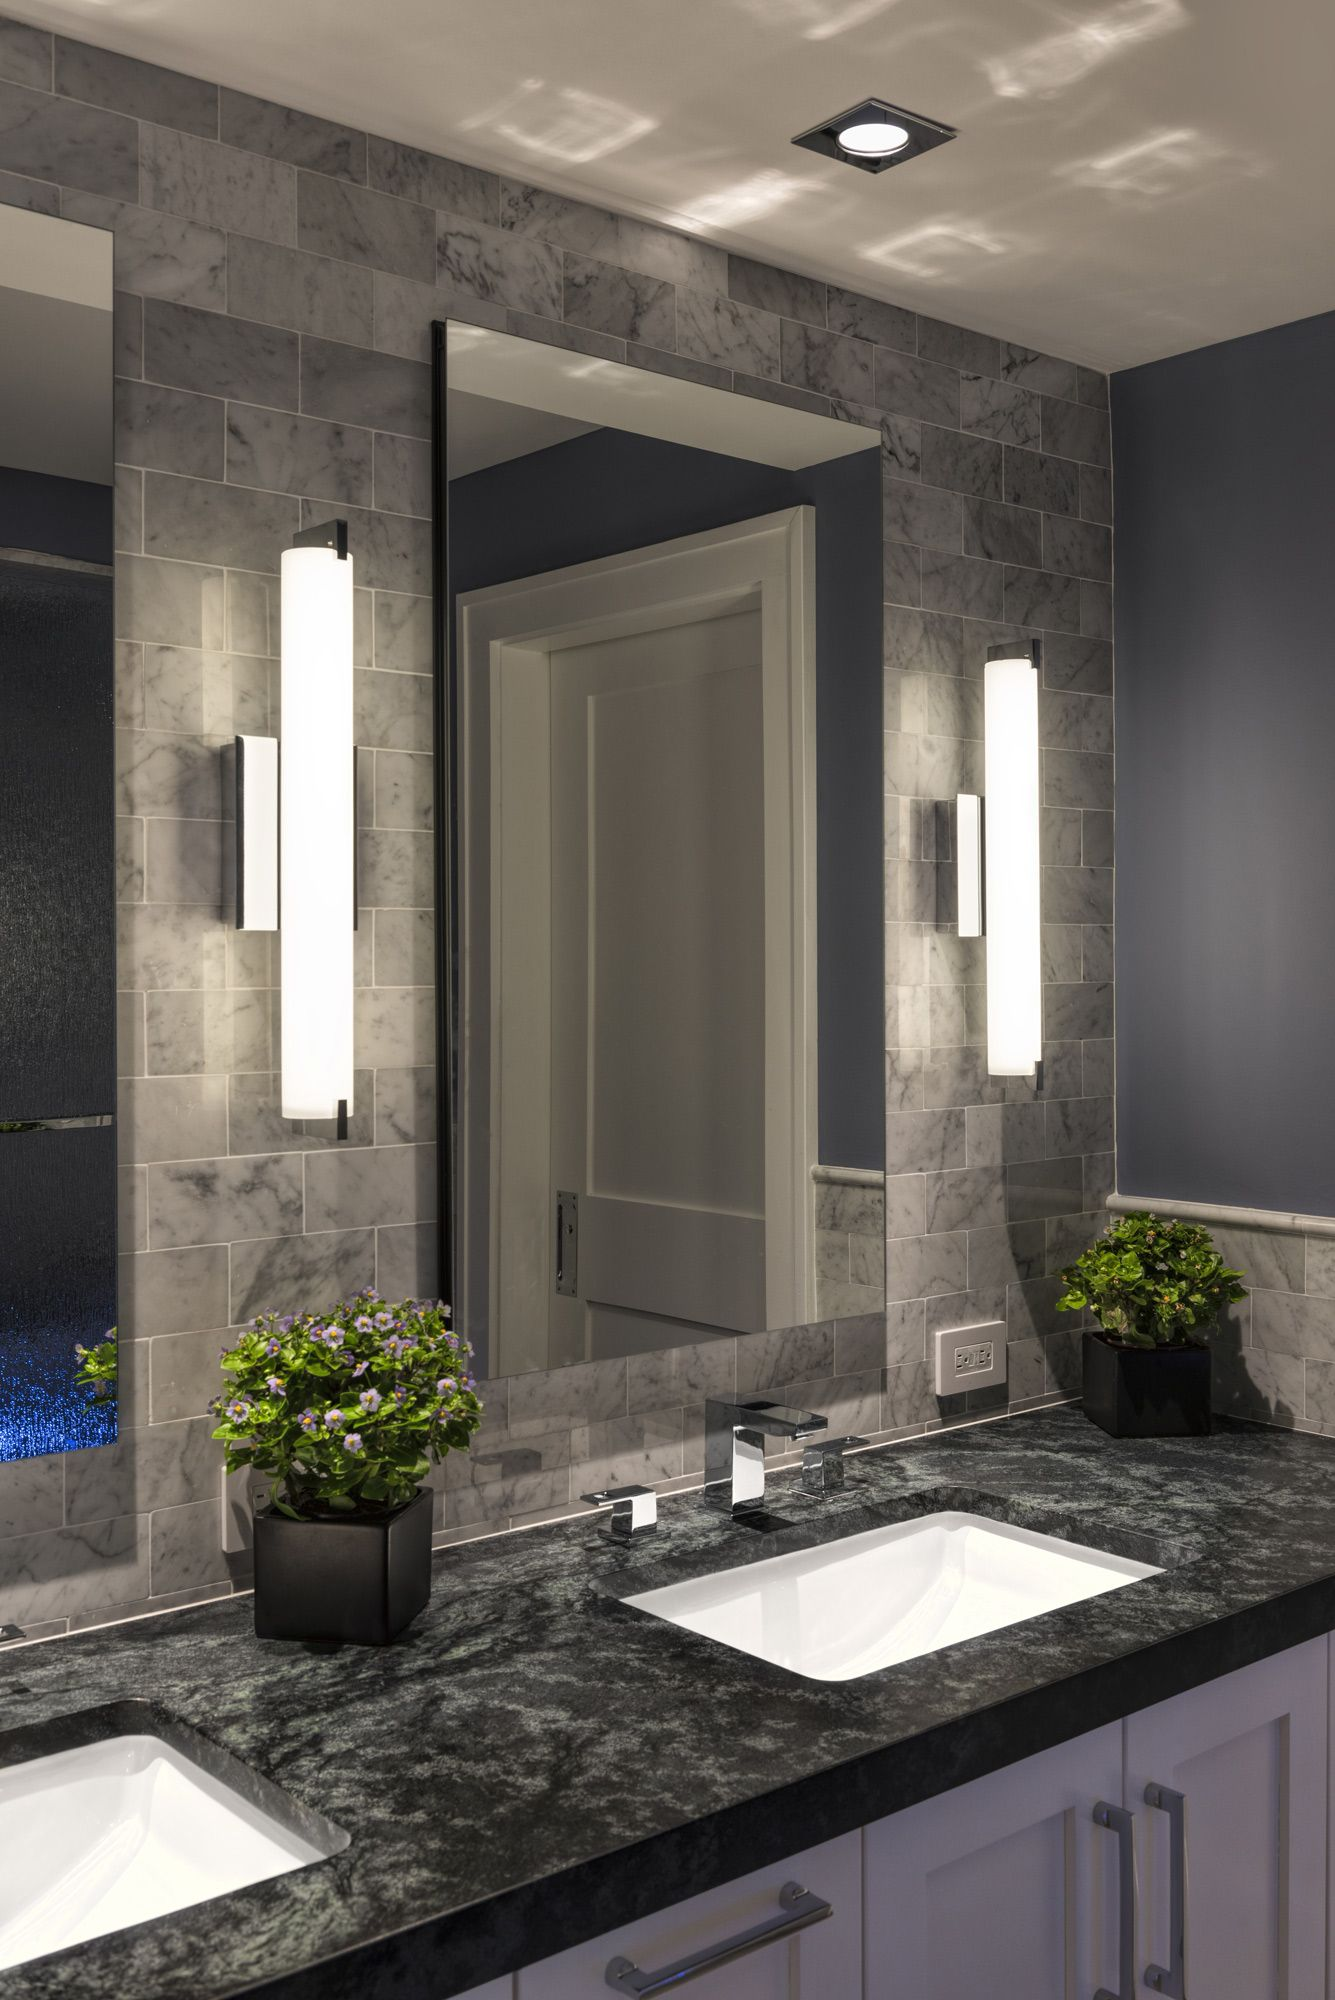 Installation Gallery Bathroom Lighting Bathroom Lighting George Kovacs Best Bathroom Lighting Amazing Bathrooms Bathroom Lighting